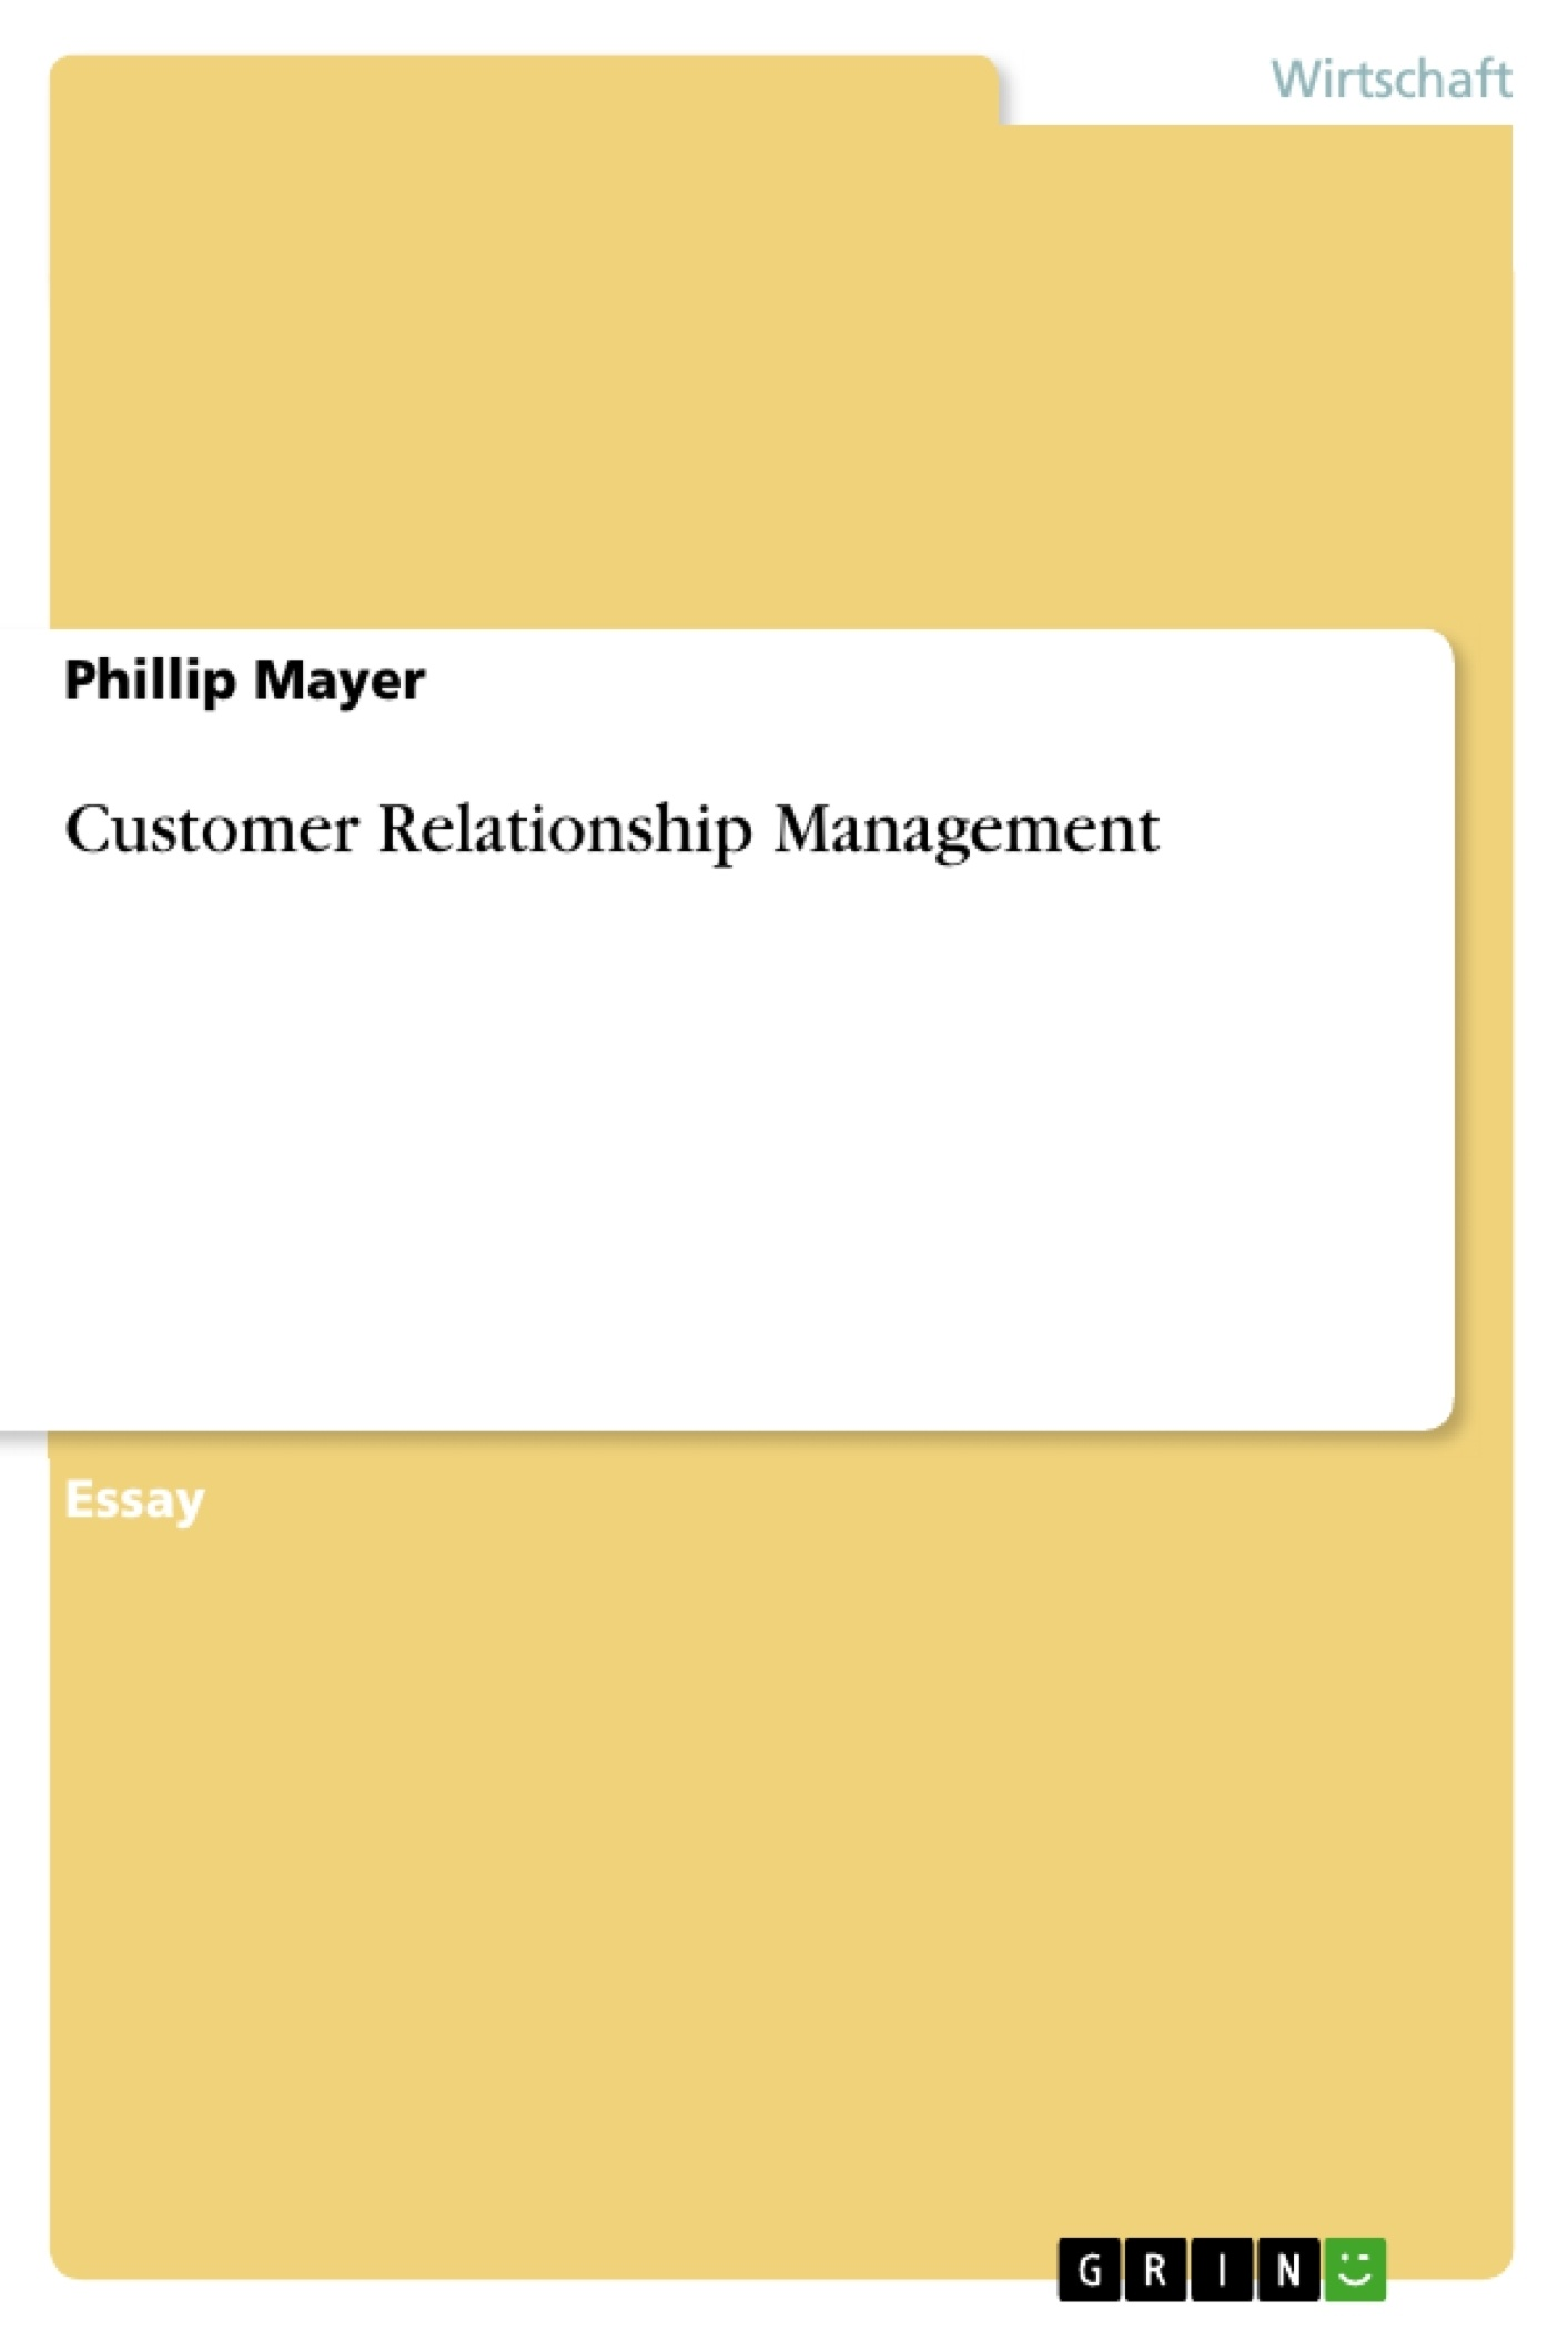 Titel: Customer Relationship Management